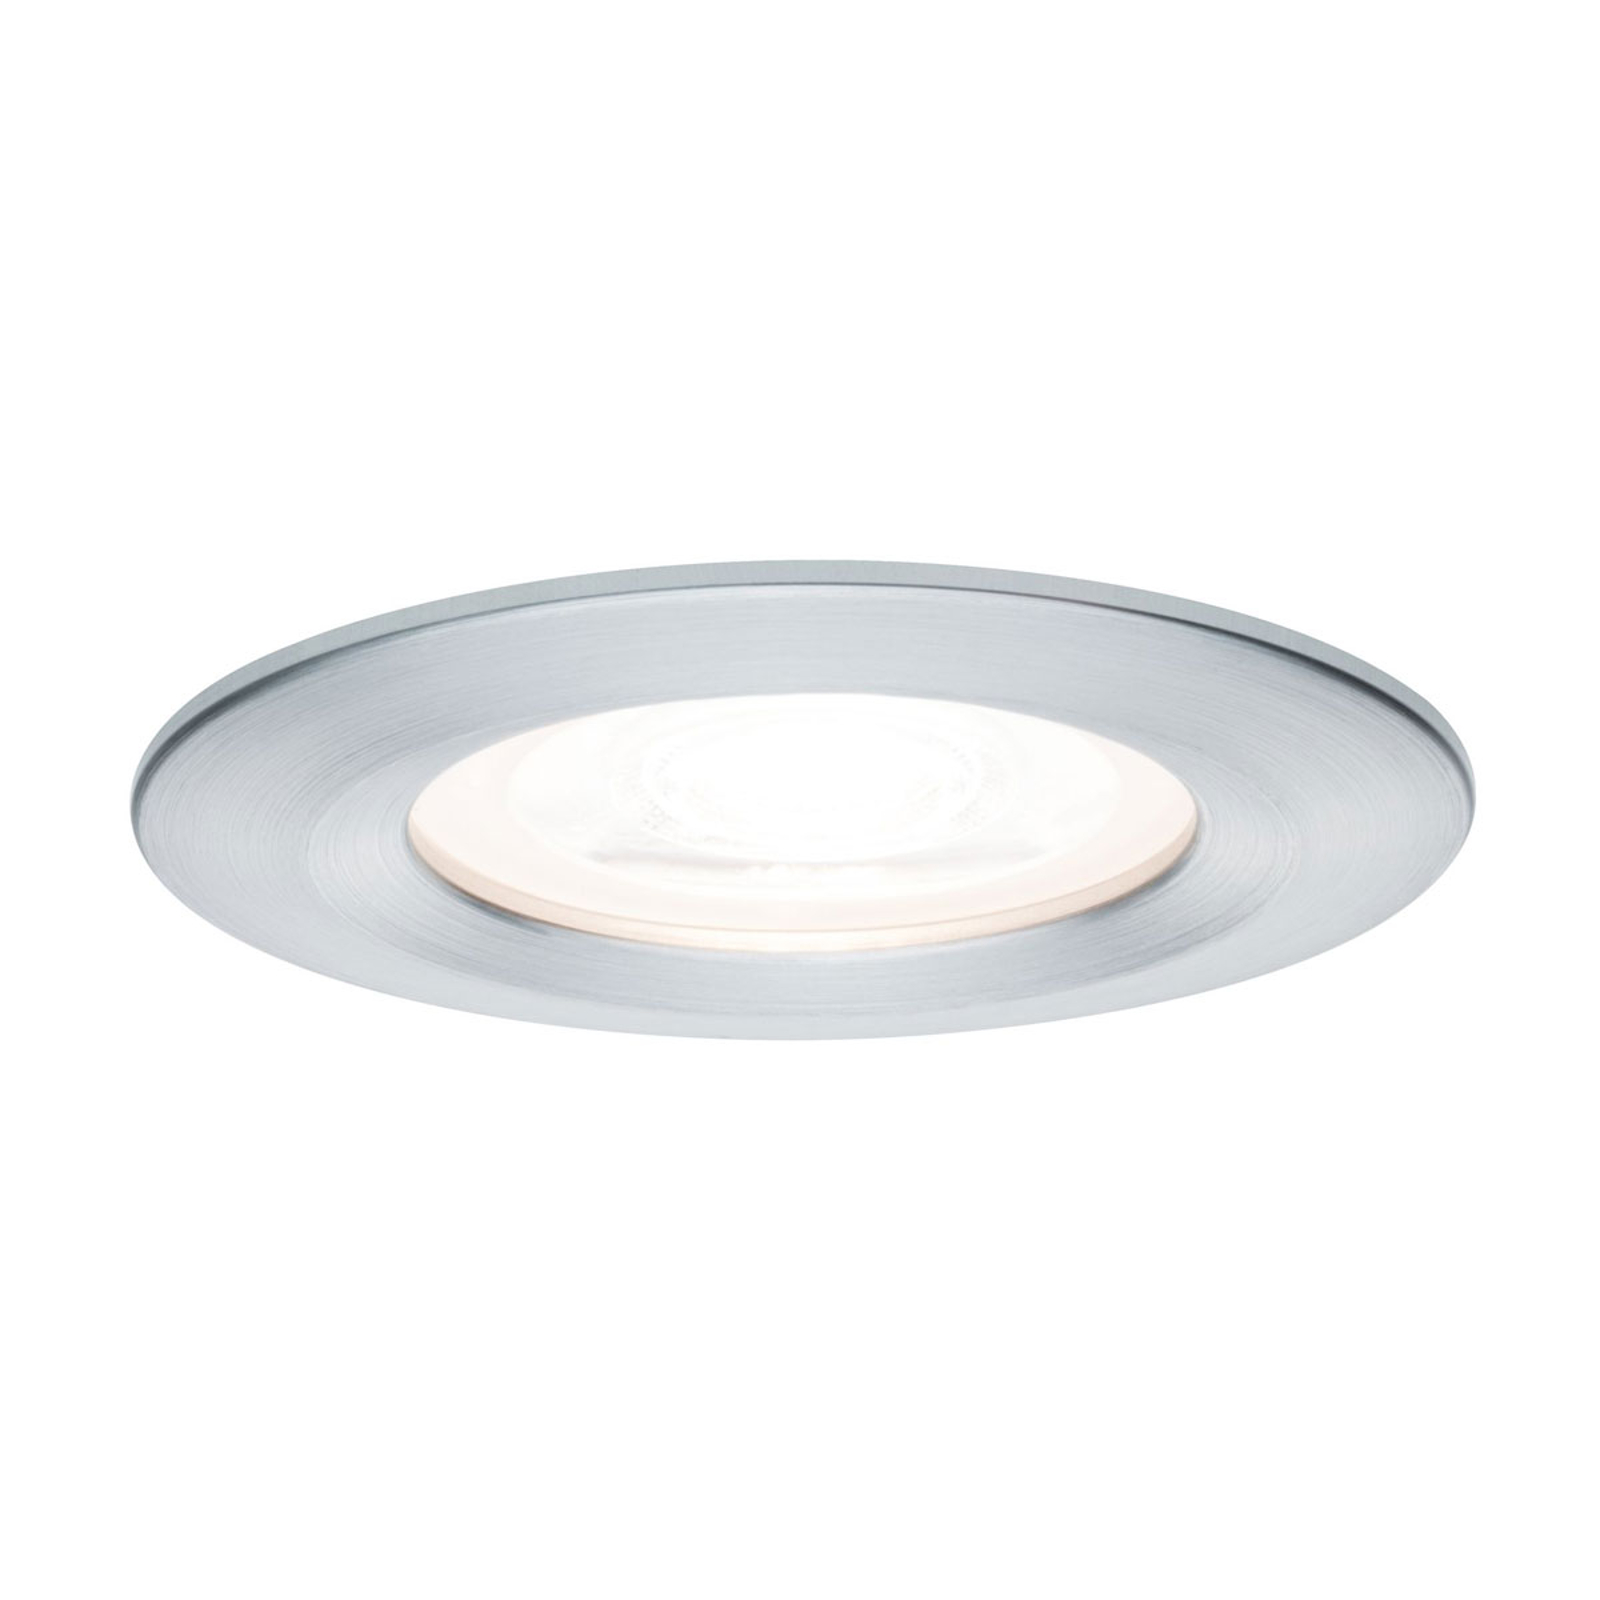 Paulmann LED-Spot Nova rund, IP44, dimmbar, Alu